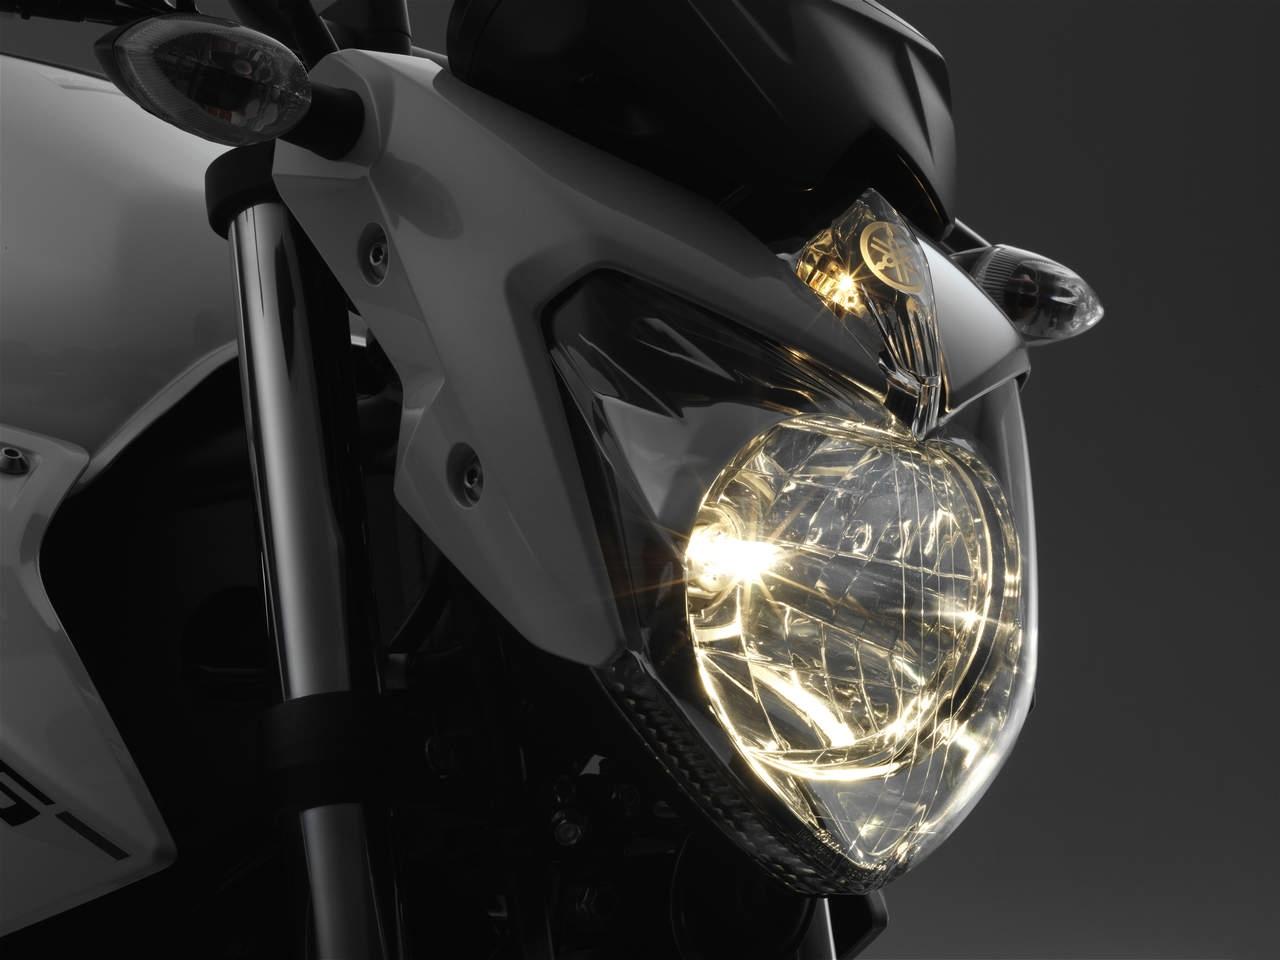 2013, terbaru sebut saja Kawasaki yang meluncurkan 2013 New Ninja 250